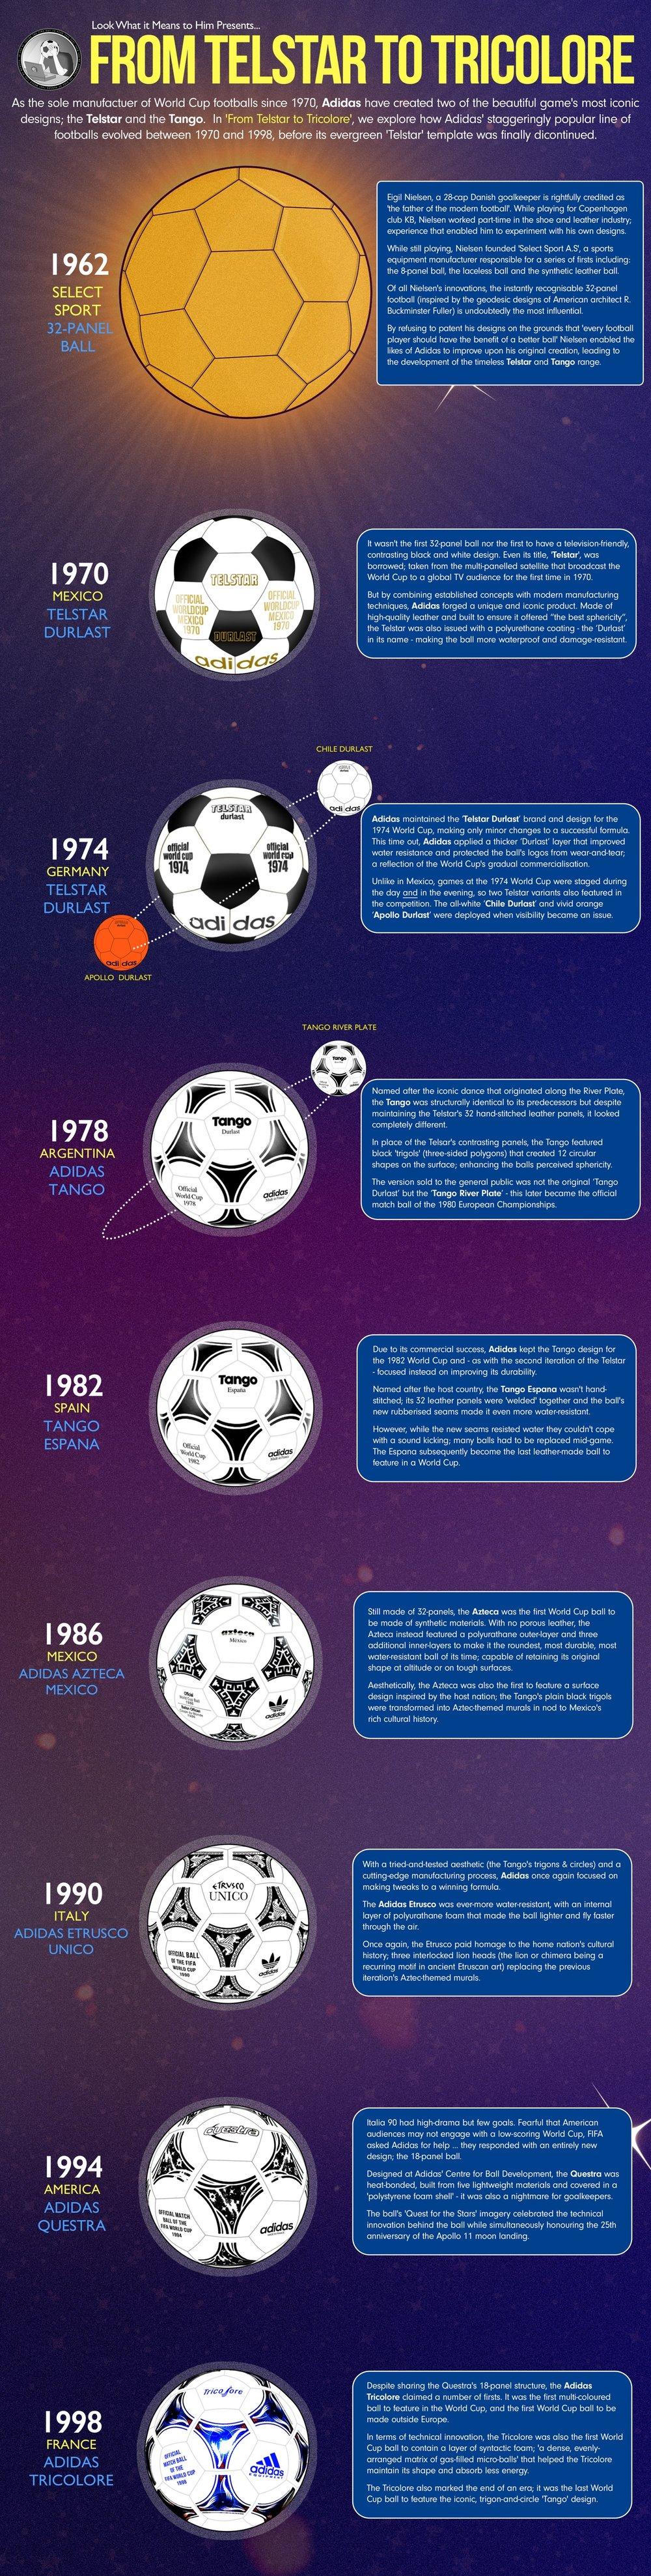 LWIMTH.Telstar.Tricolore.Infograph.jpg